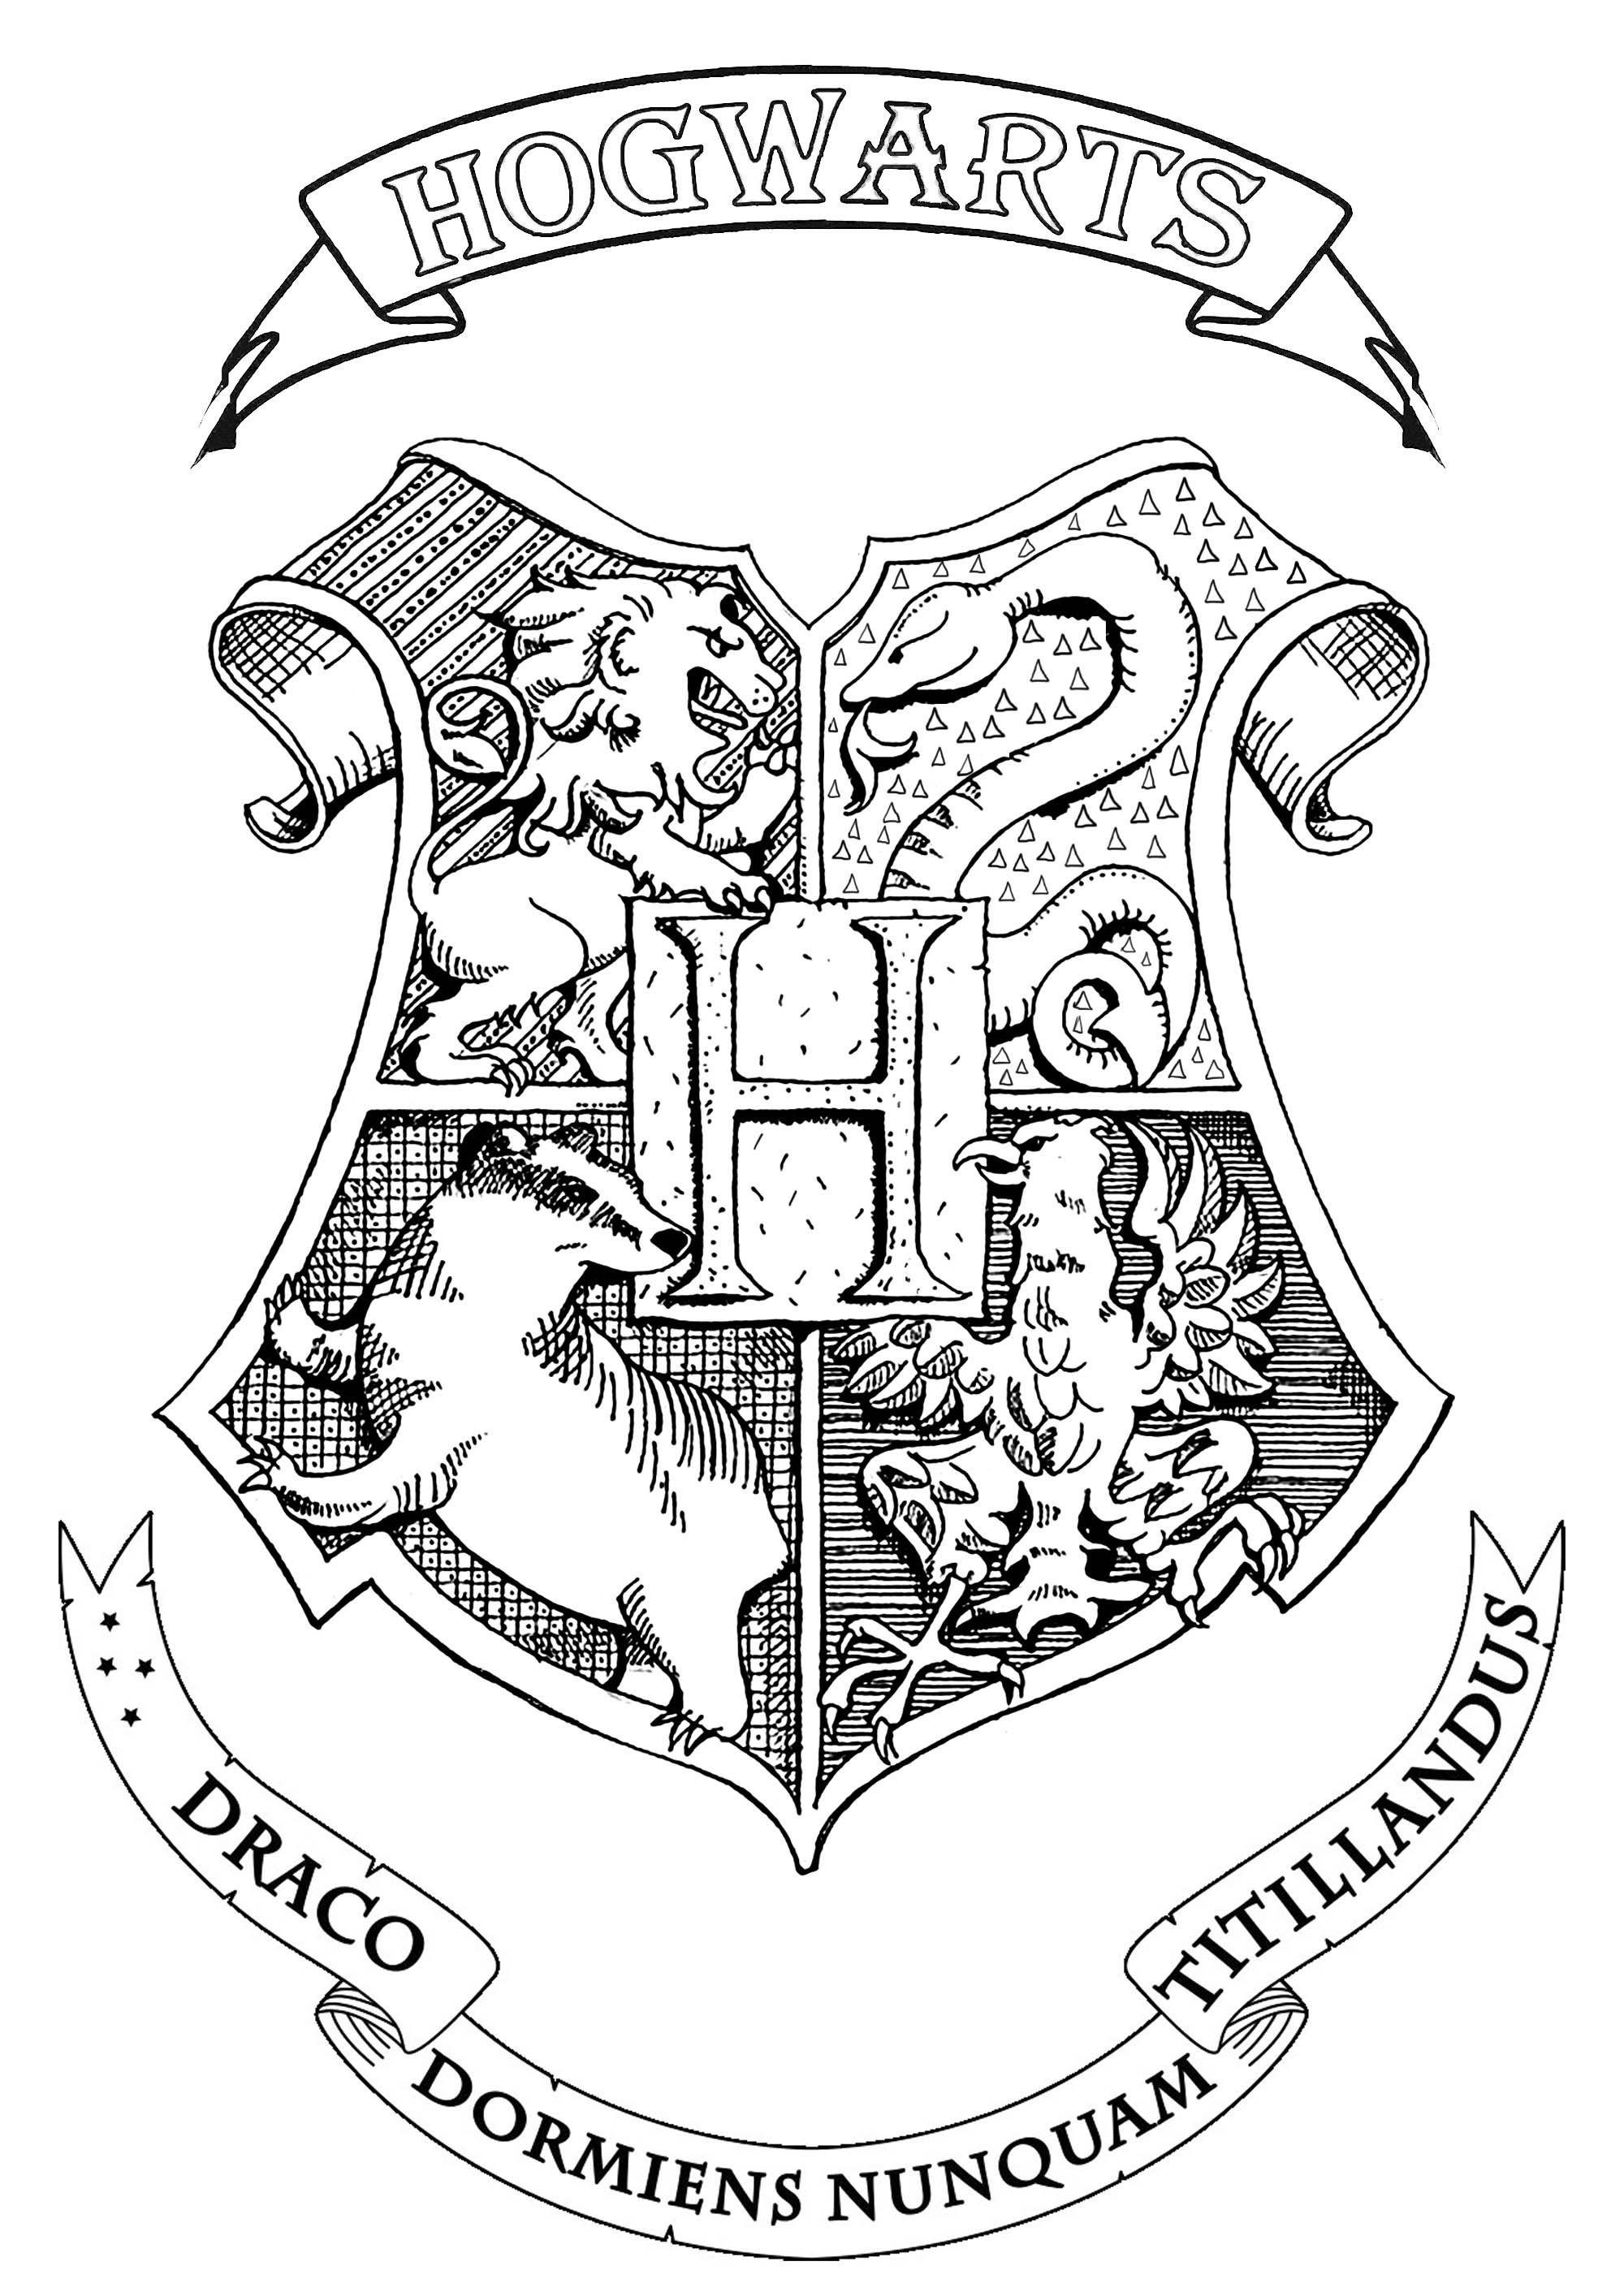 Hogwarts Logo Drawing : hogwarts, drawing, Symbol,, Emblem,, Seal,, Sign,, Hogwarts, School, Witchcraft, Wizardry, Harry, Potter, Colors,, Sketch,, Coloring